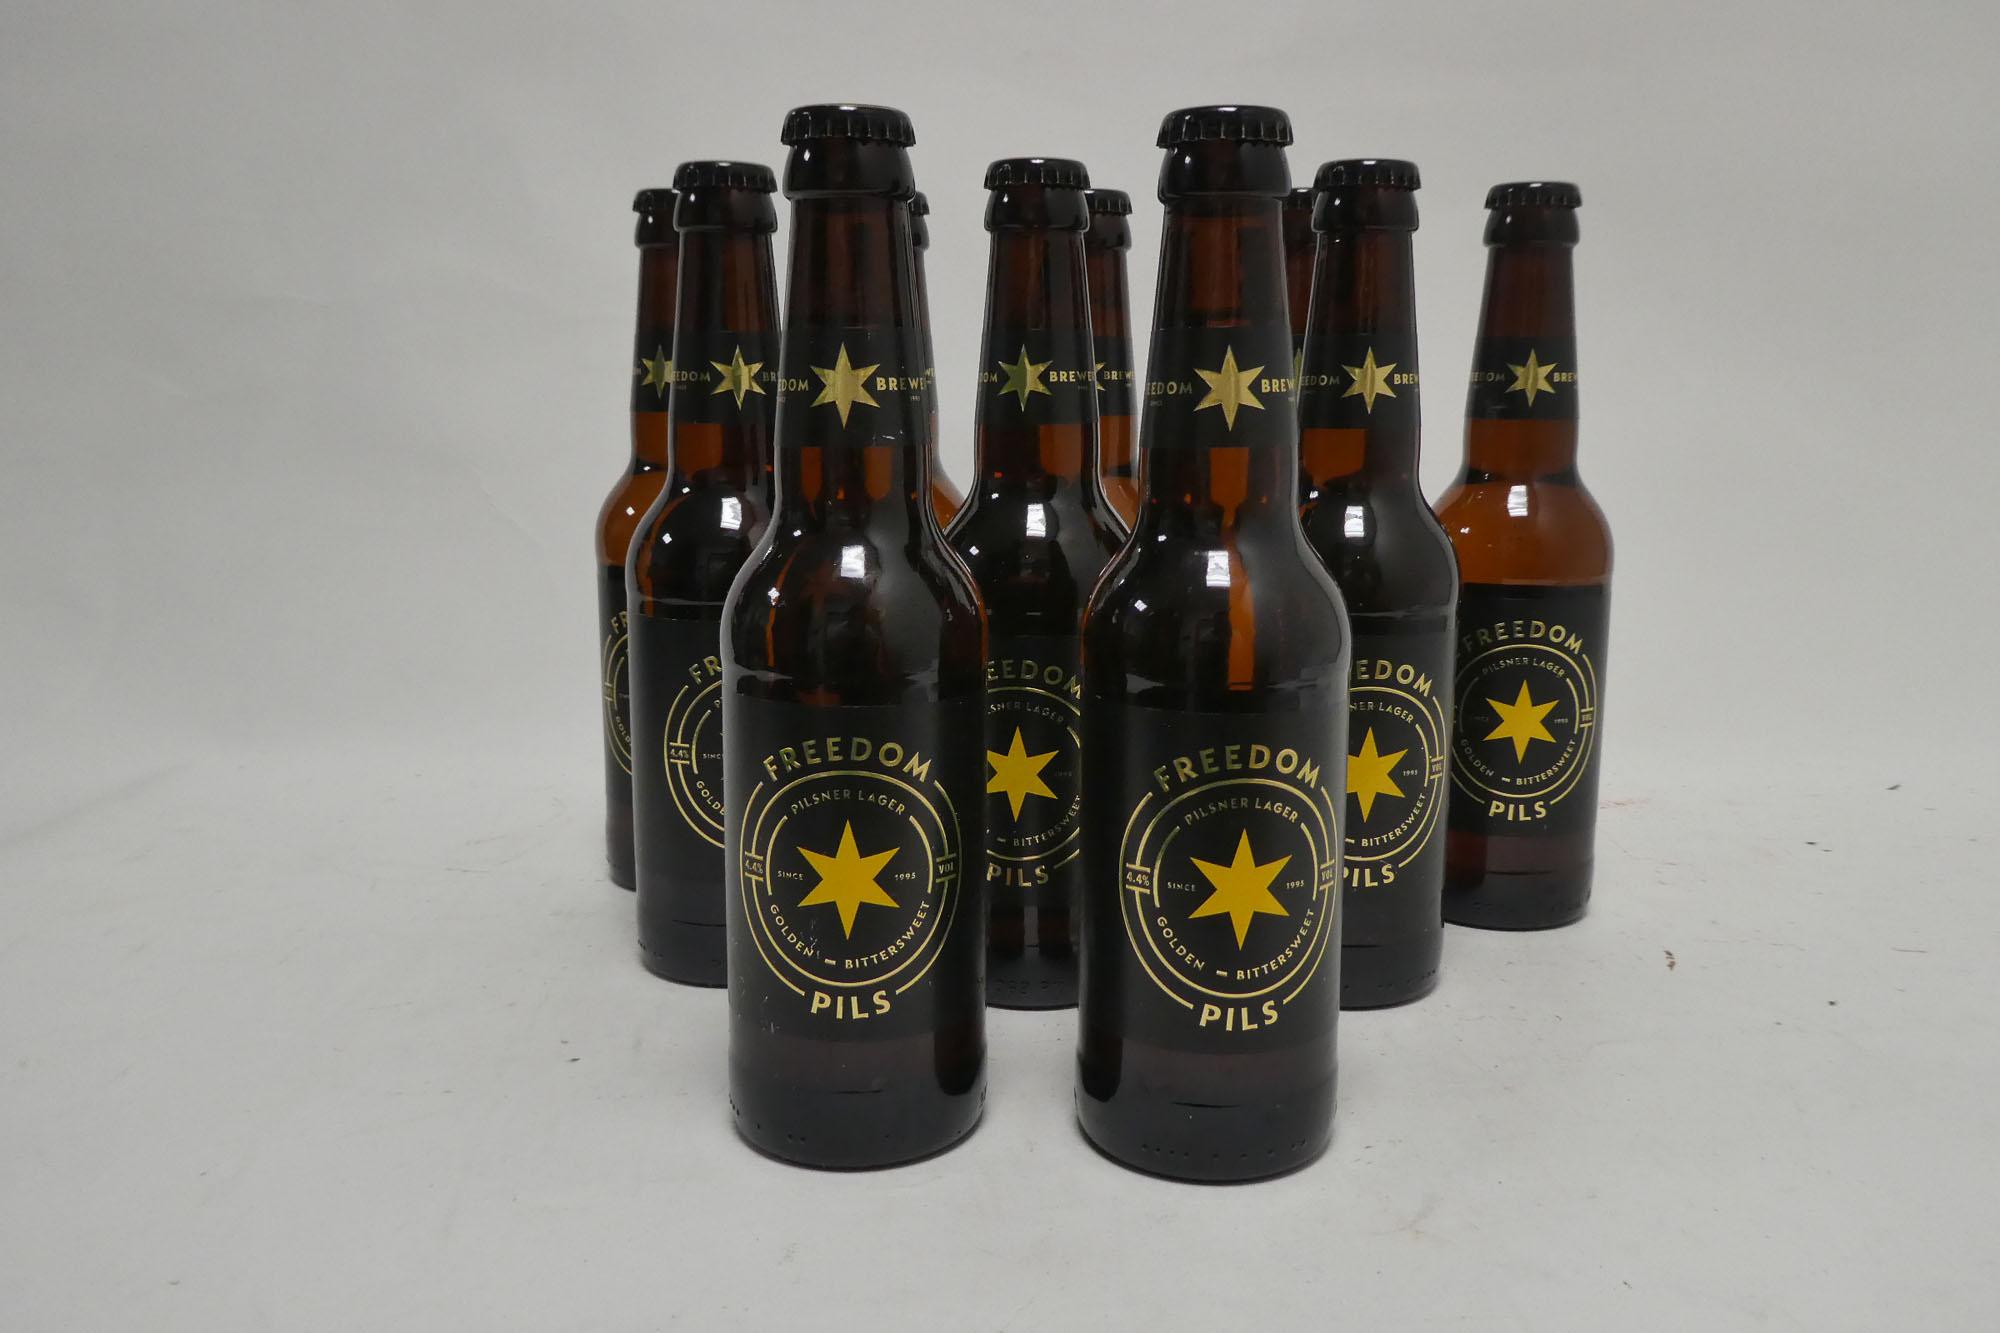 Approx 32 bottles of Beer, 21x Freedom Pilsner Lager 33cl 4.